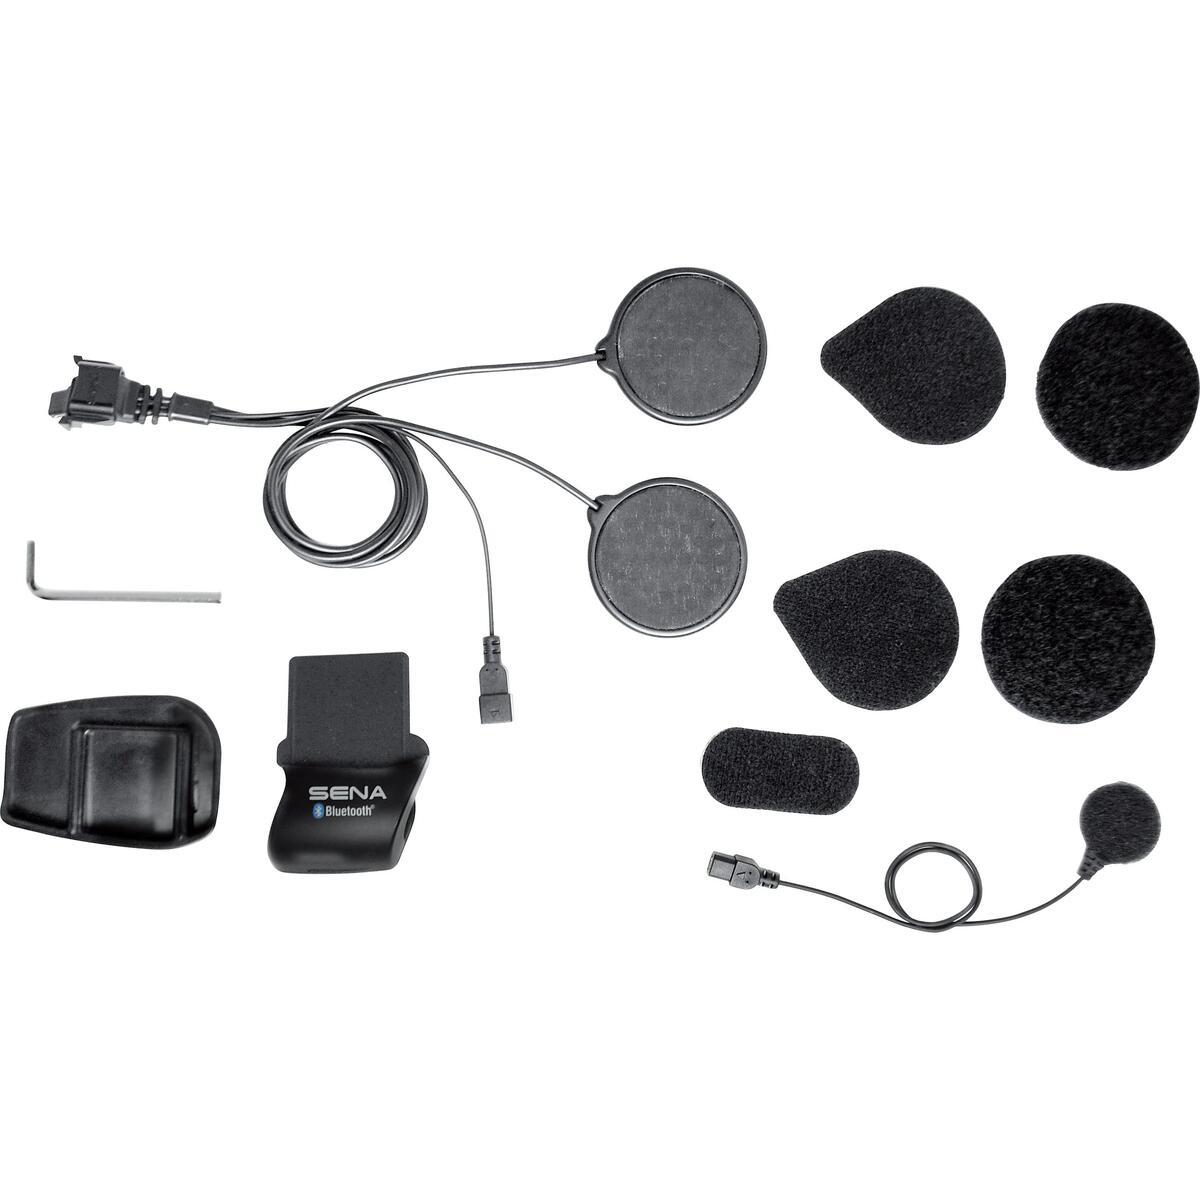 Bild 5 von Sena            SMH5-FM Bluetooth Headset Universal Dual Pack